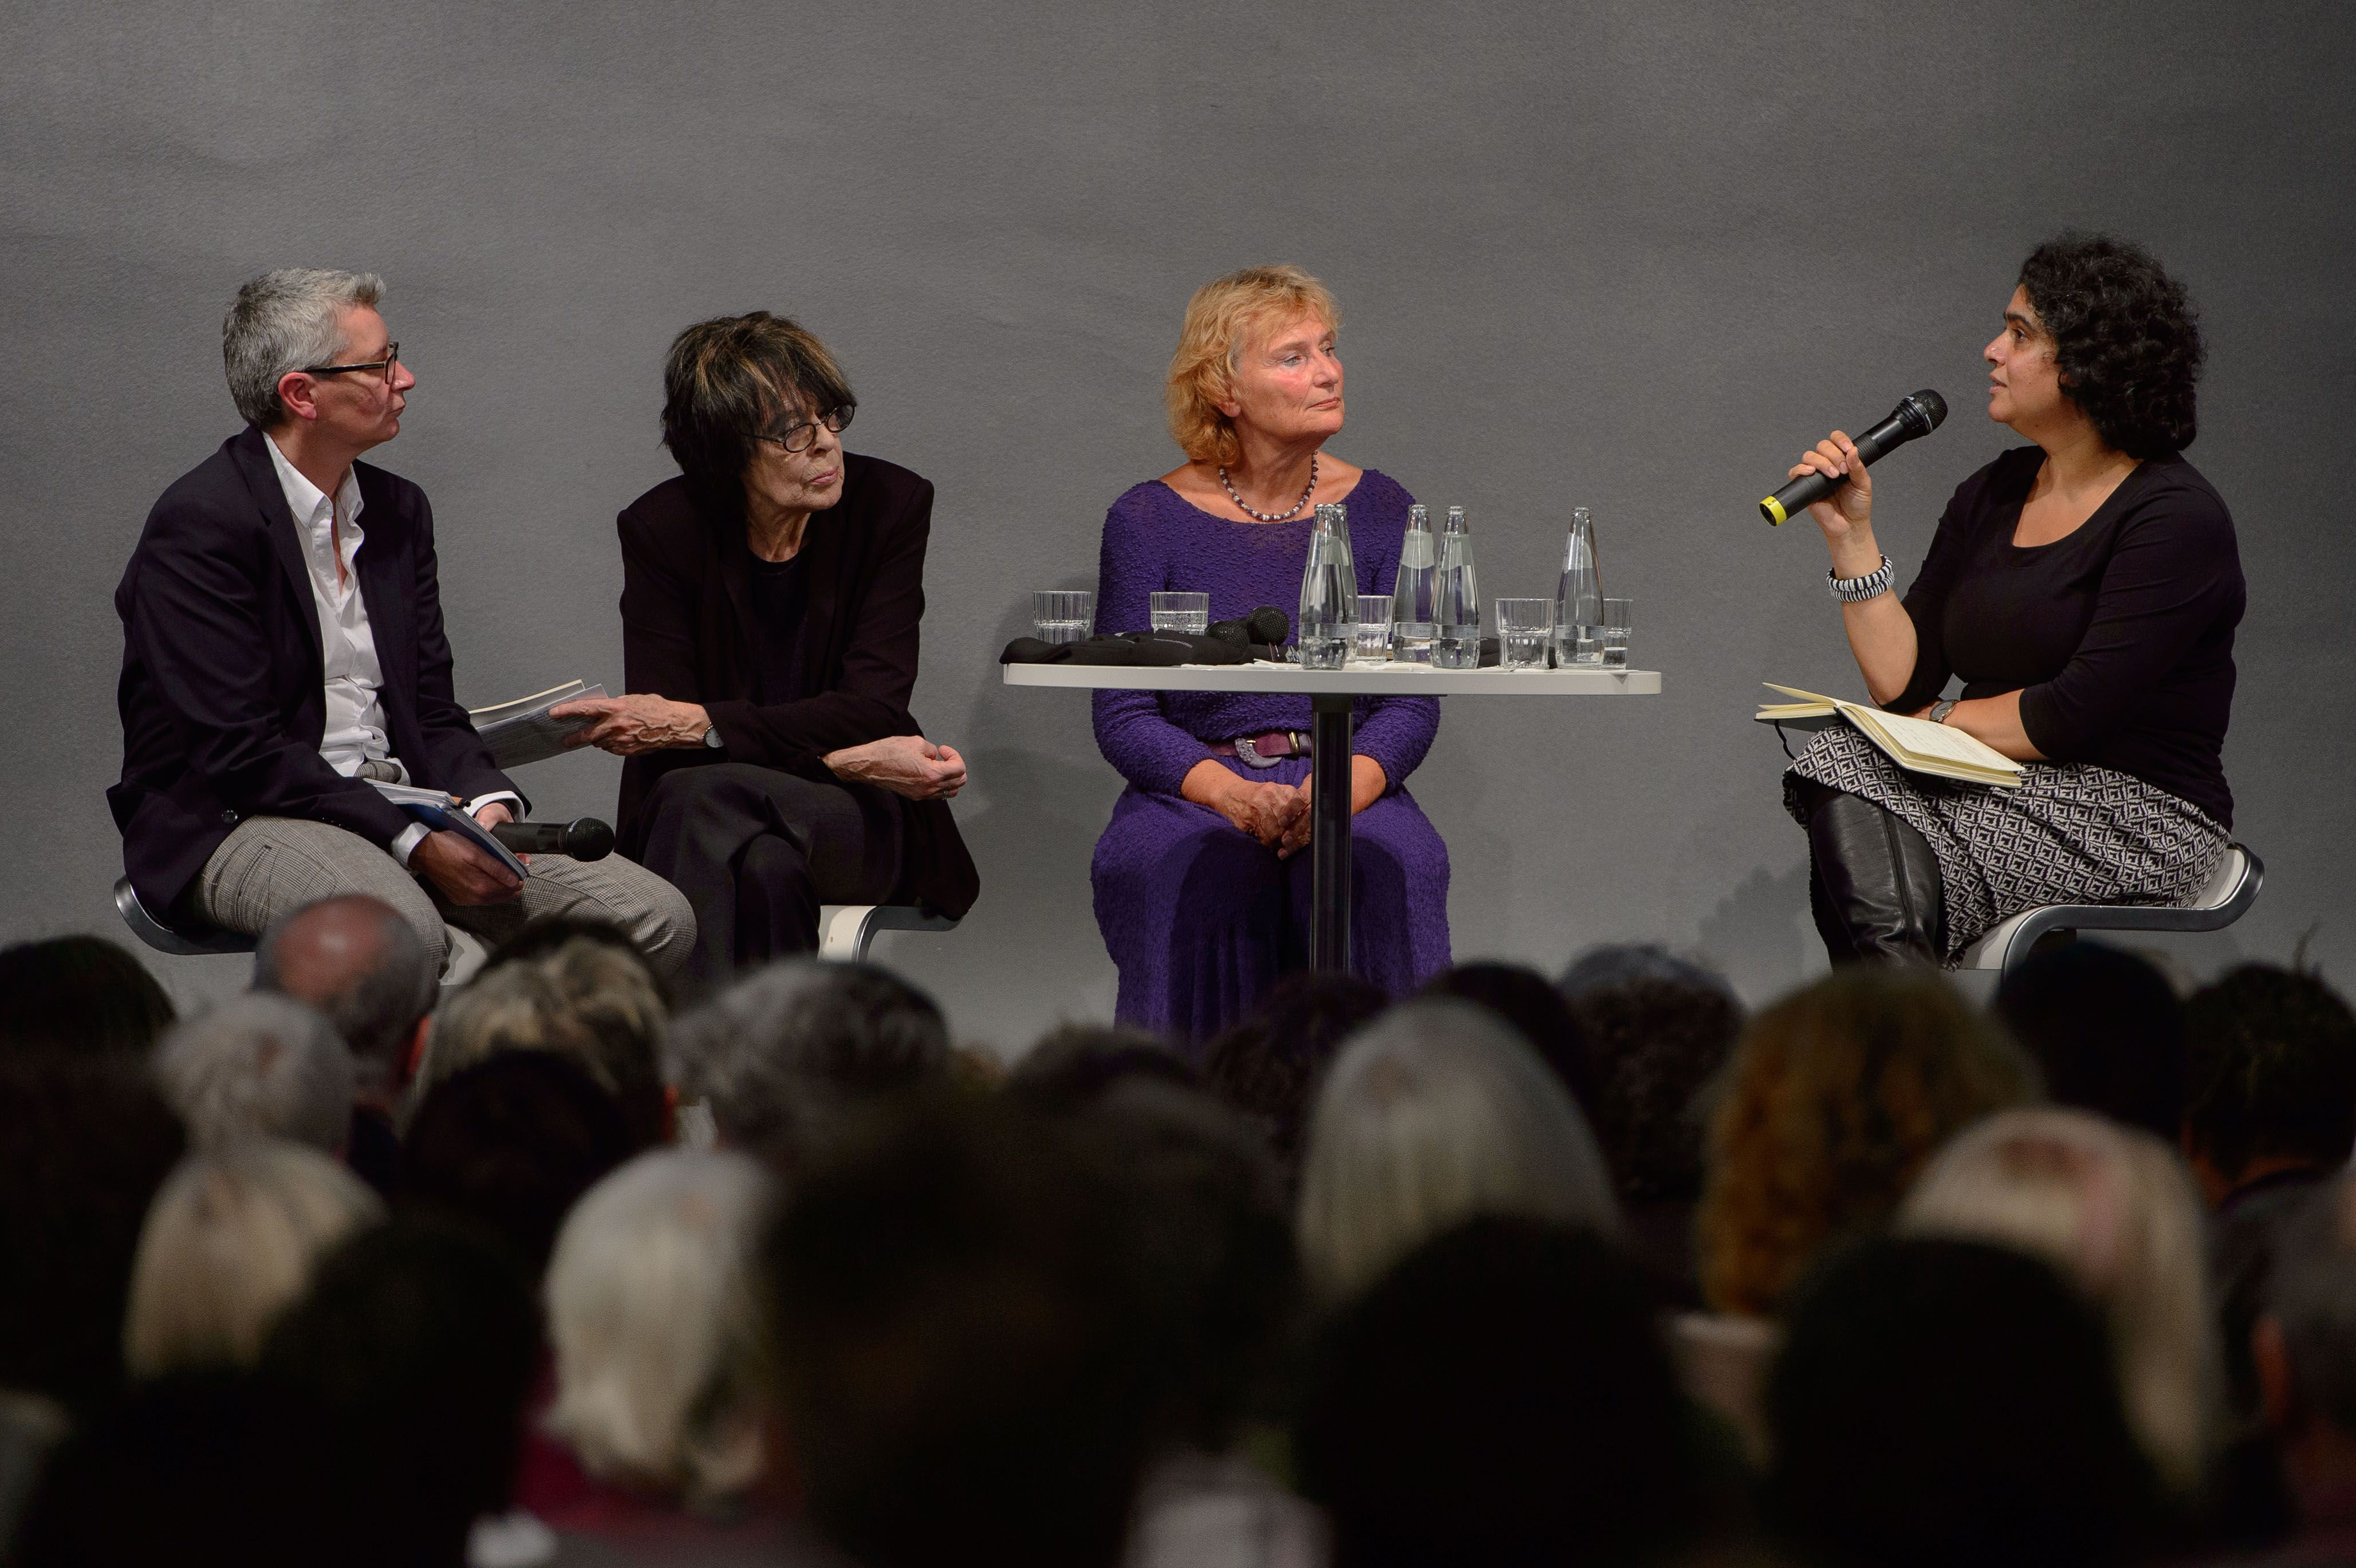 Podium v.l.n.r. Sabine Hark, Christina Thürmer-Rohr, Gitti Hentschel, Nivedita Prasad